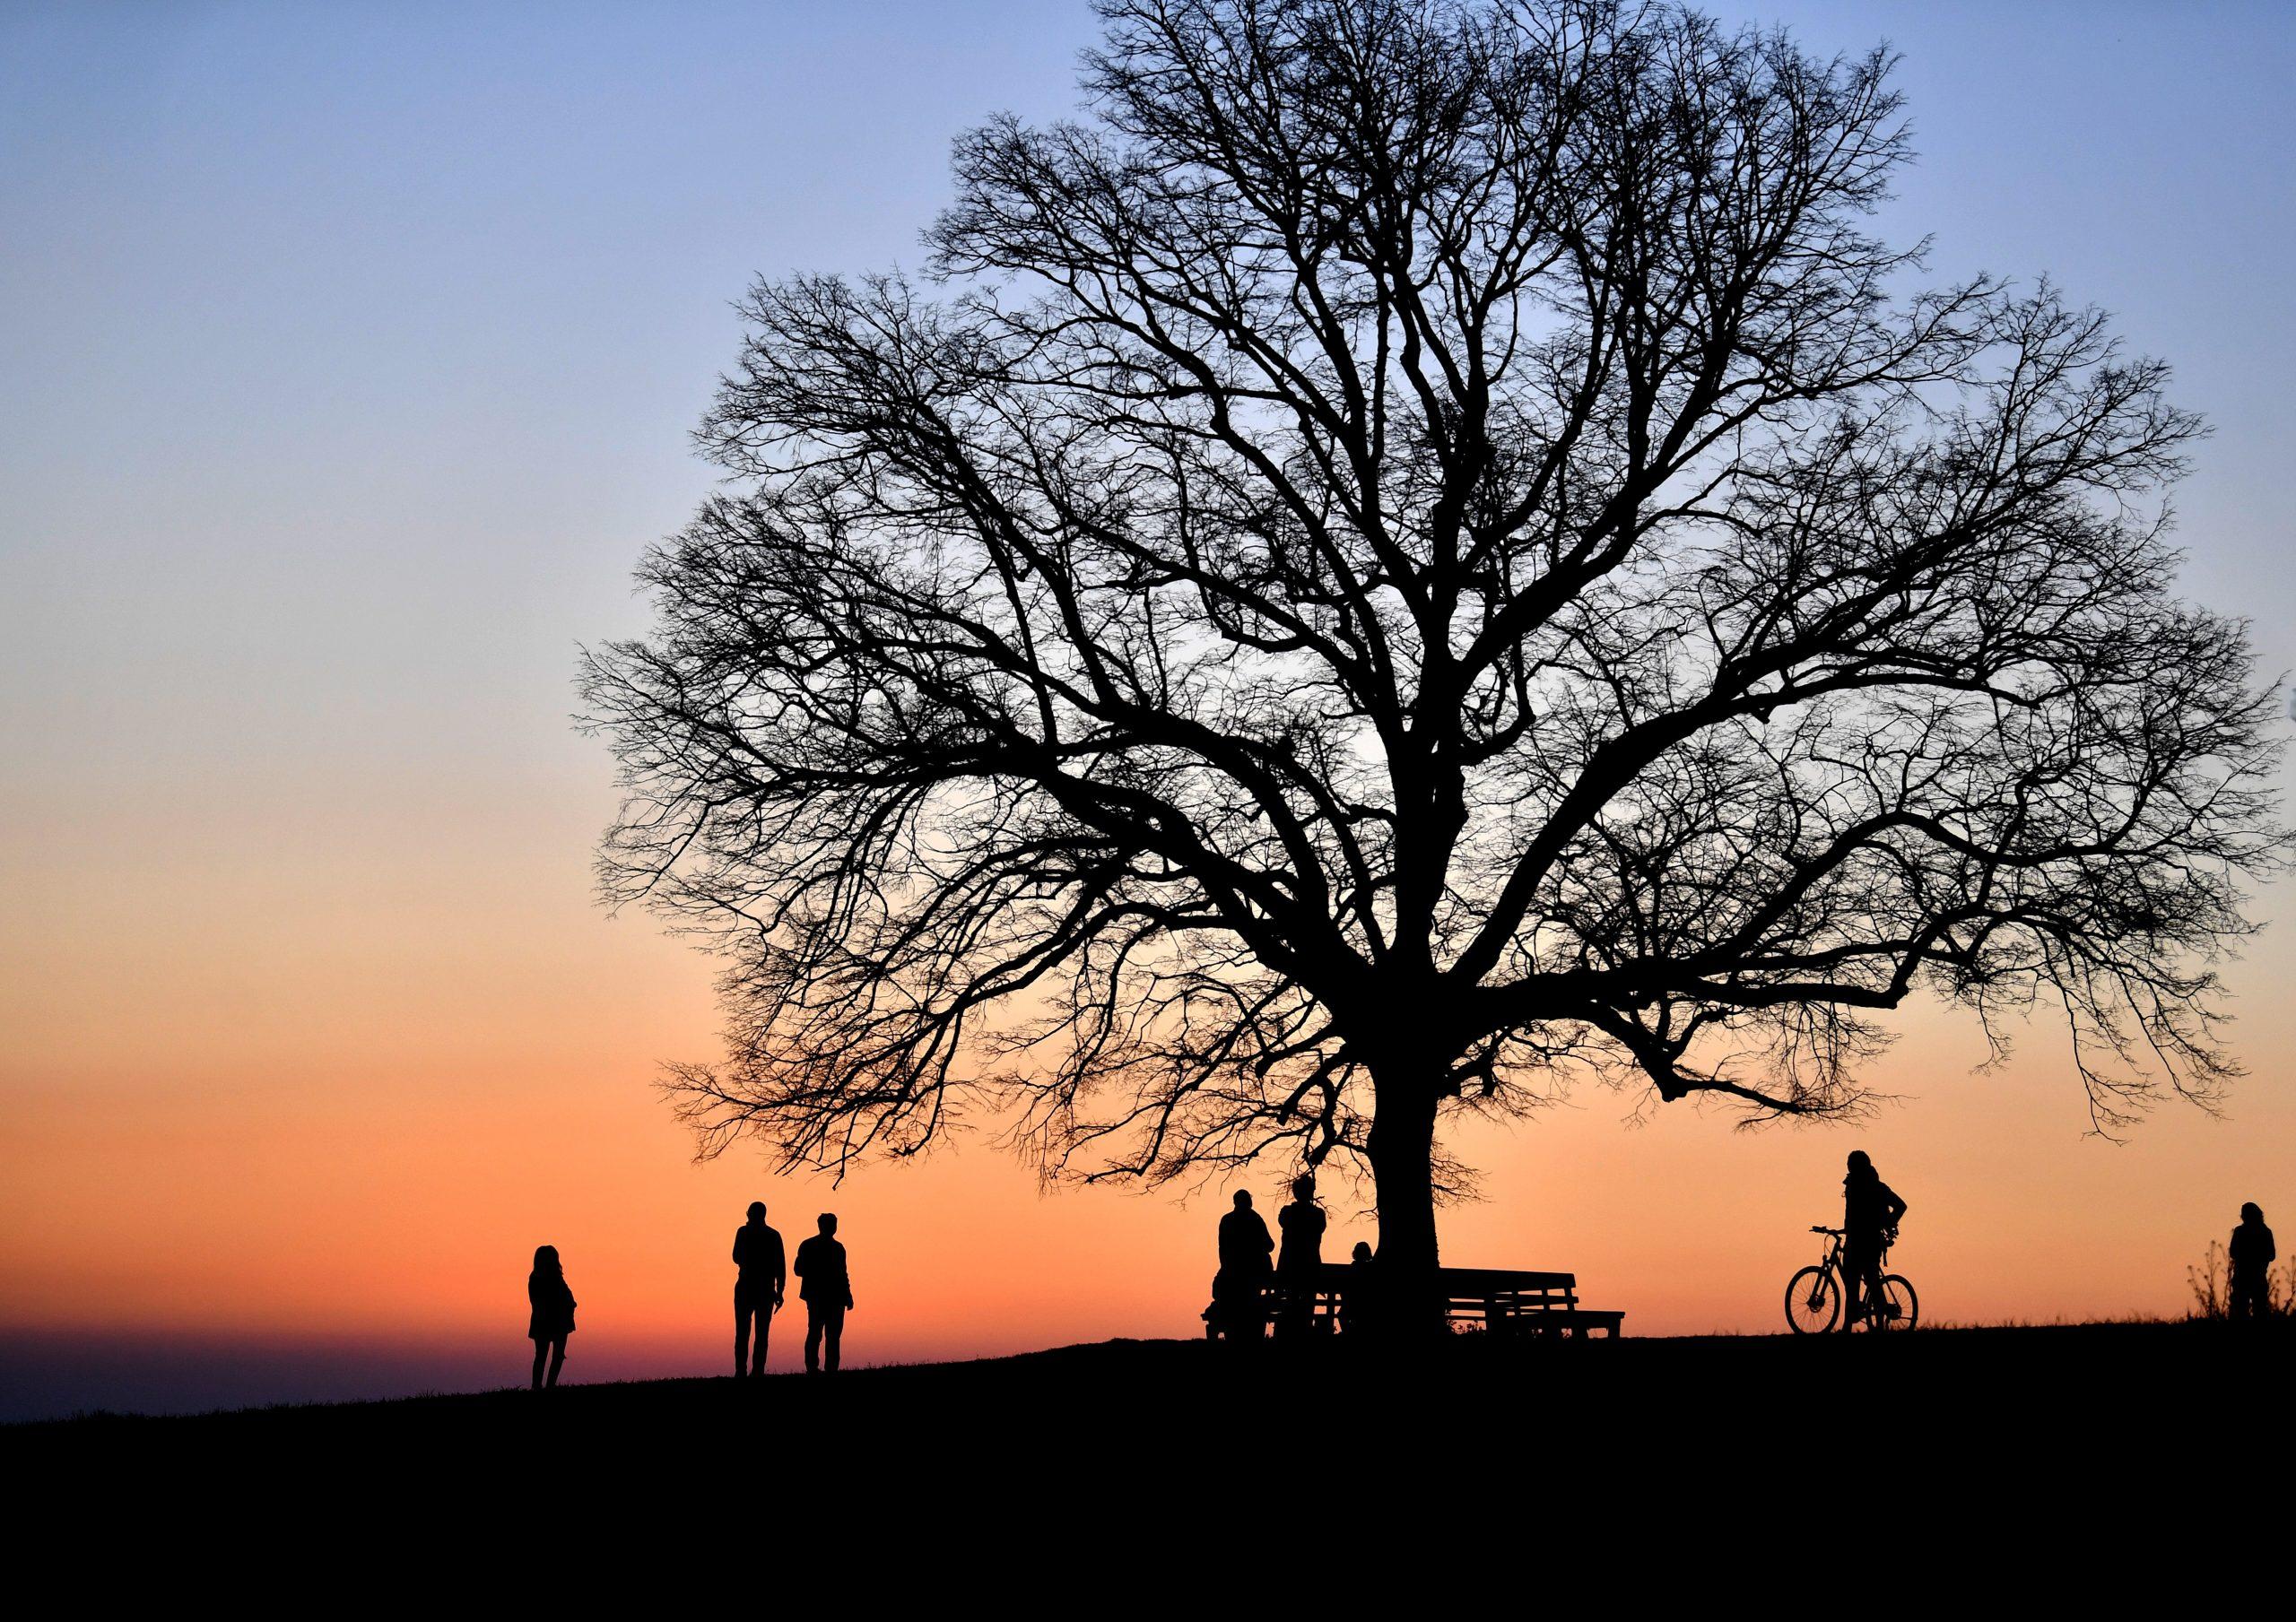 Besucher des Plainberges betrachten den Sonnenuntergang am Mittwoch, 8. April 2020. Im Zuge der Coronavirus-Ma§nahmen gelten AusgangsbeschrŠnkungen und Social Distancing.